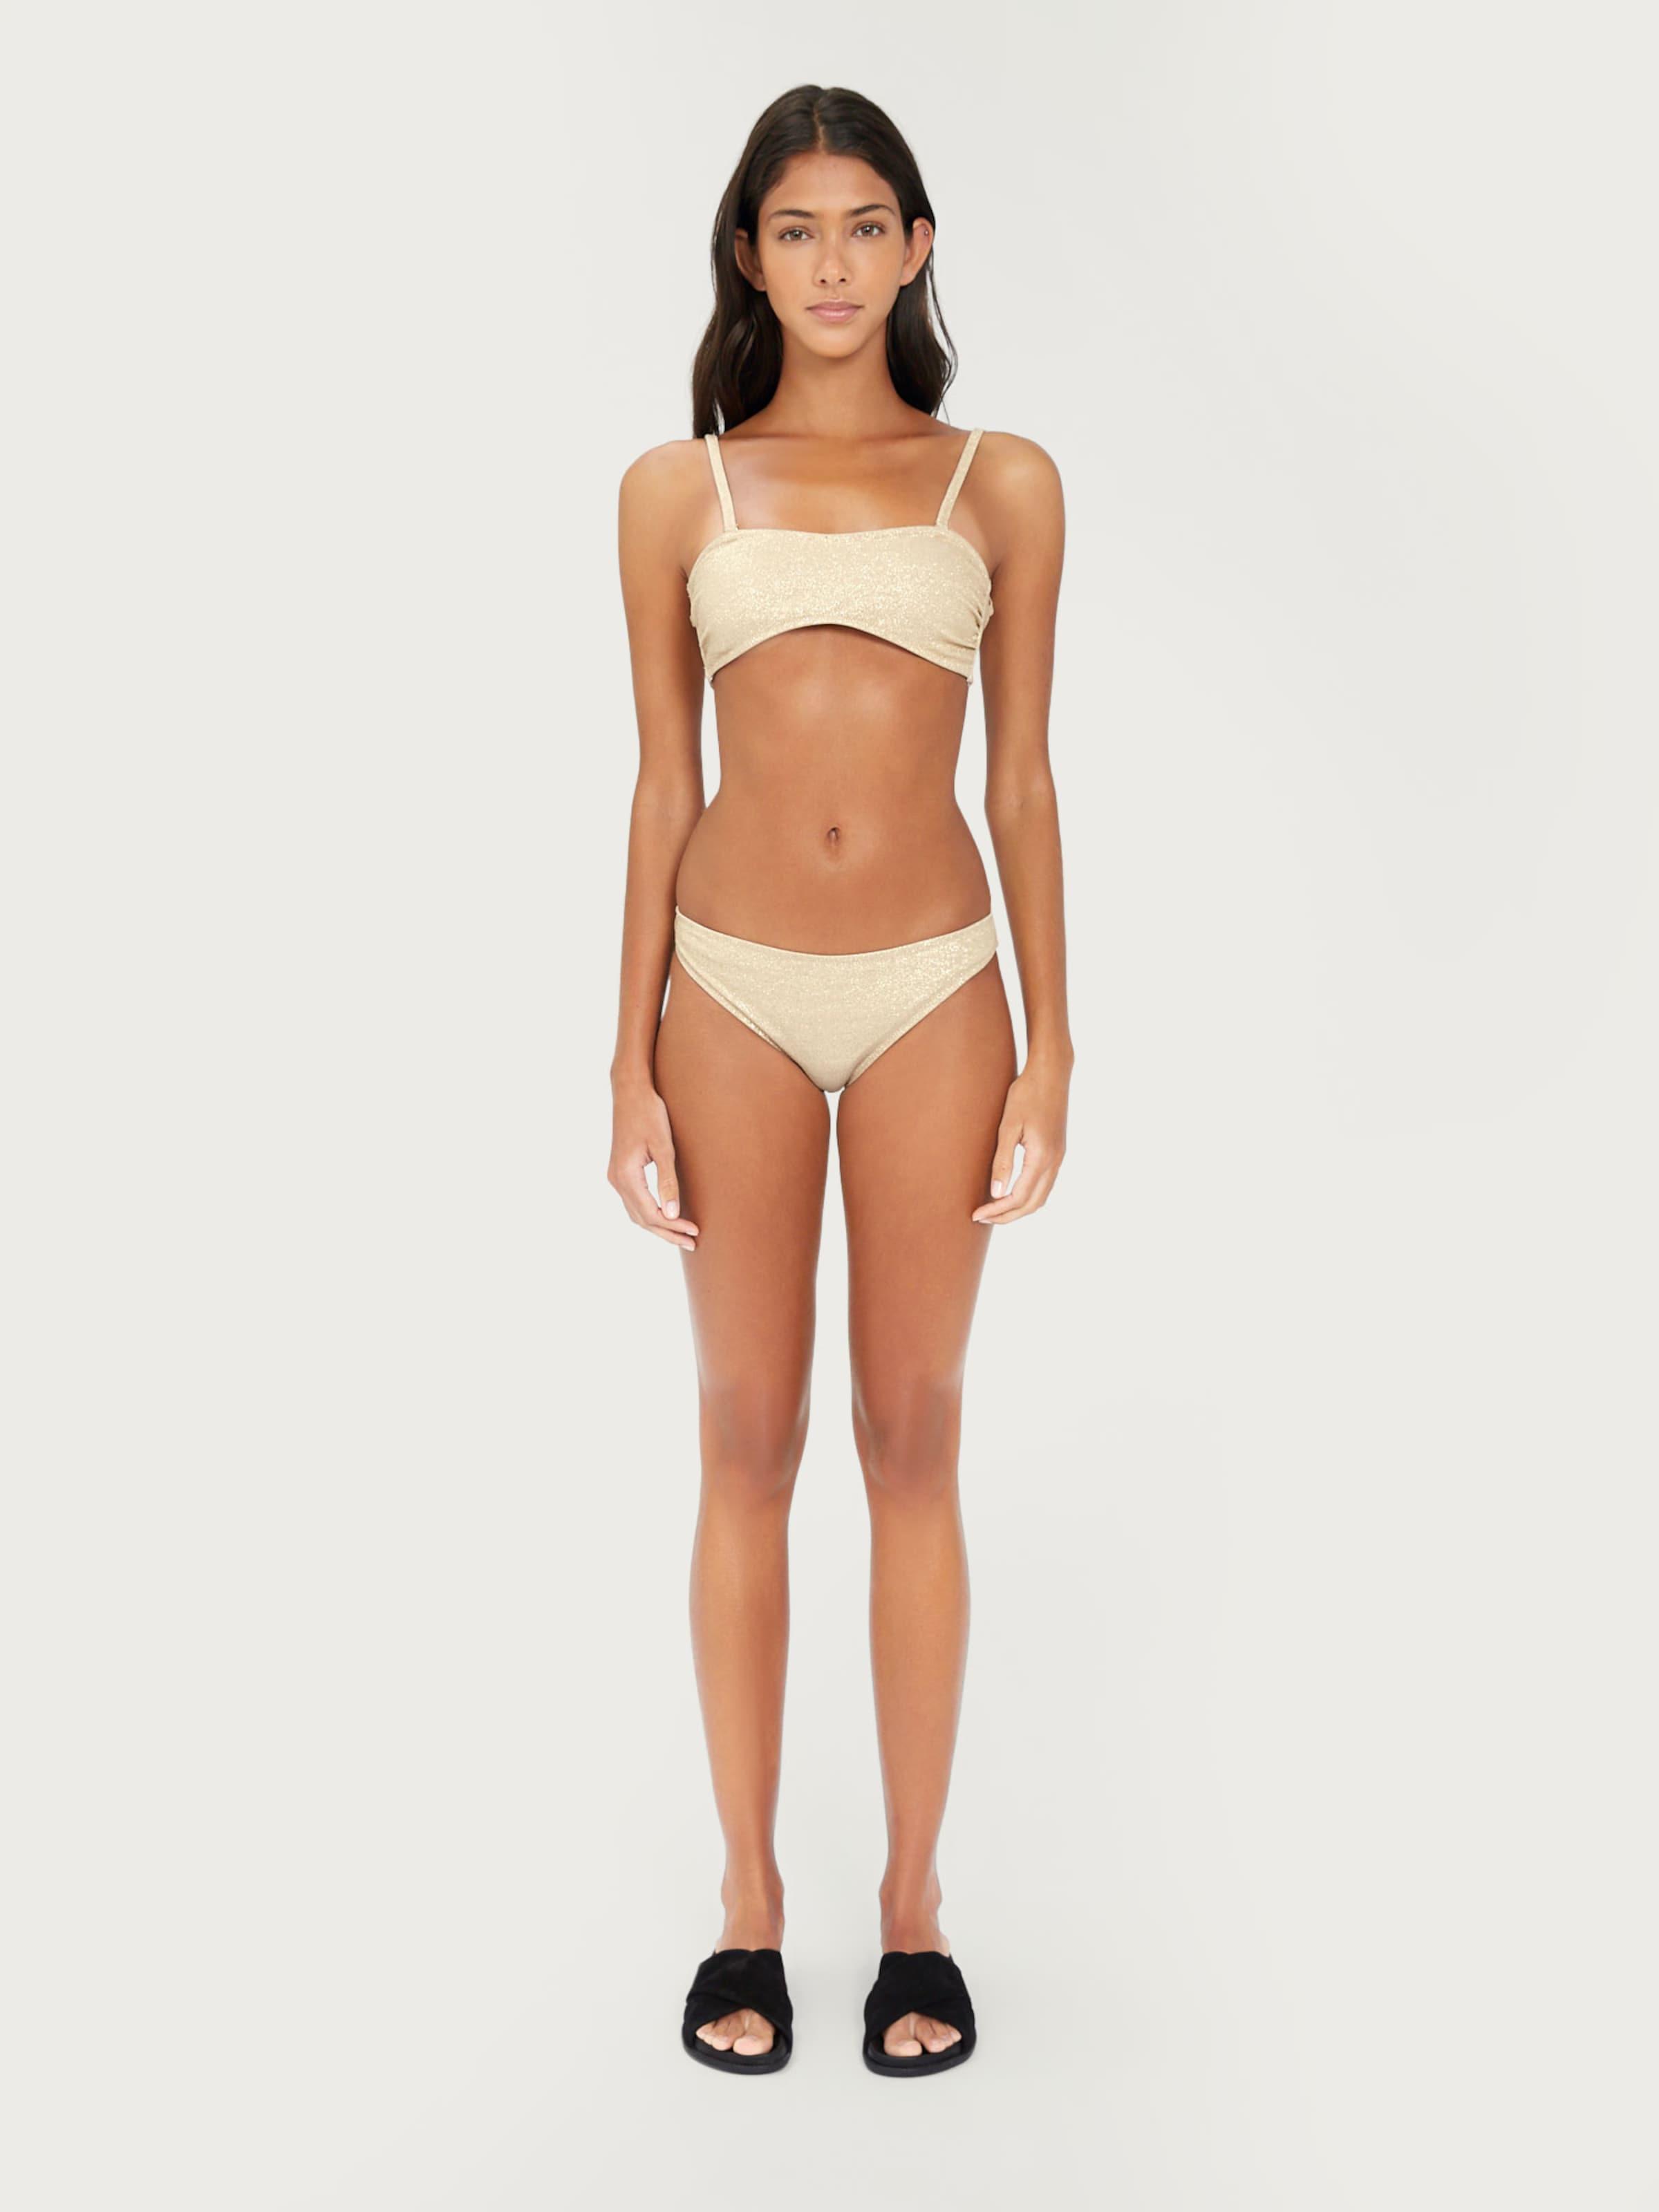 Edited Bikinitop In Goldgelb Goldgelb Edited Bikinitop 'perrin' In 'perrin' Edited mON8nw0v